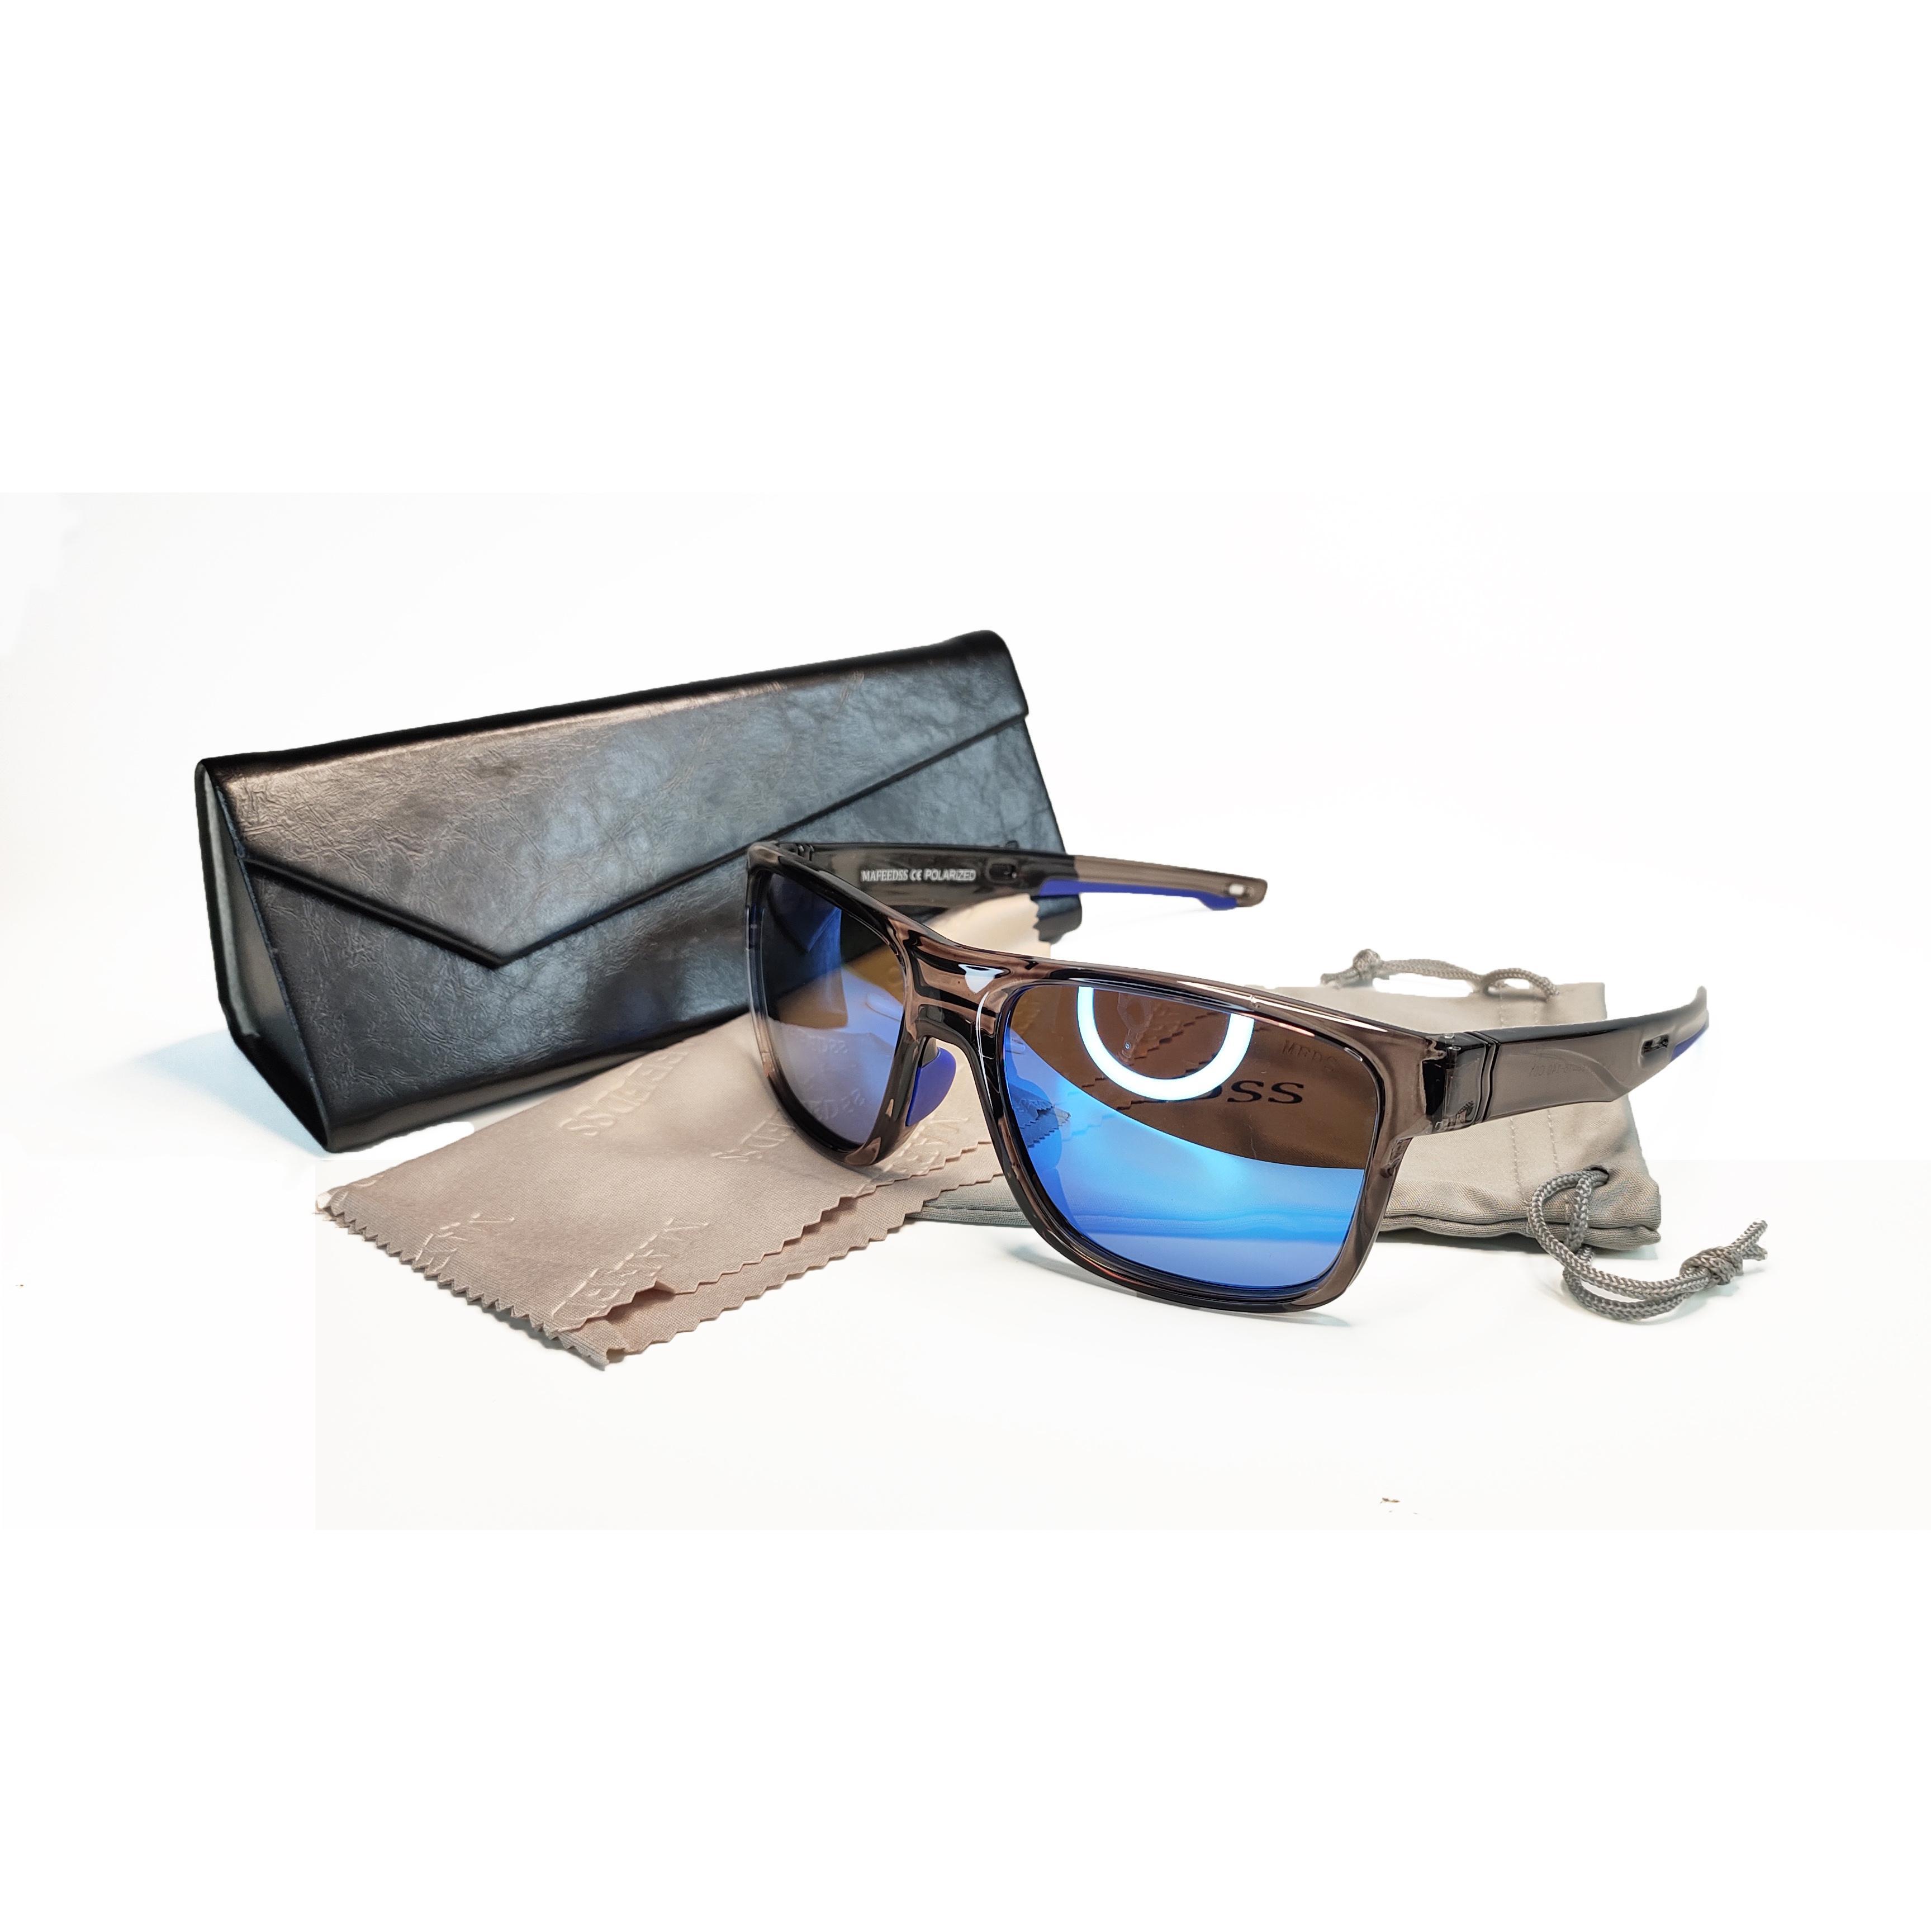 lente Homens mulheres óculos de sol Viajando escalada sol glasse Pesca Driving Suglasses TR90 Quadro Moda óculos de sol Hight Qualidade de marca de óculos de sol